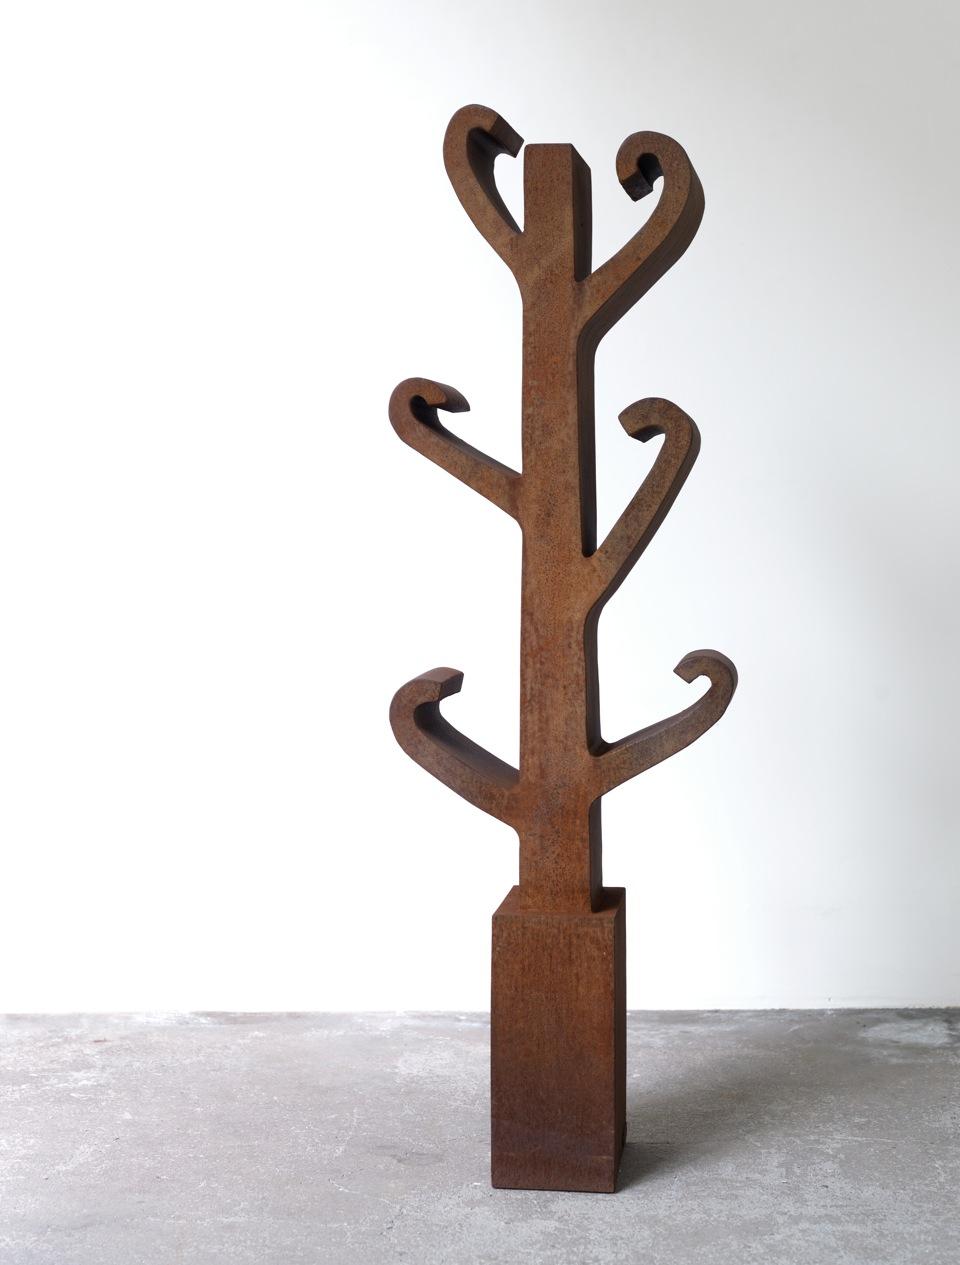 Galerie Wilms - Piet Warffemius